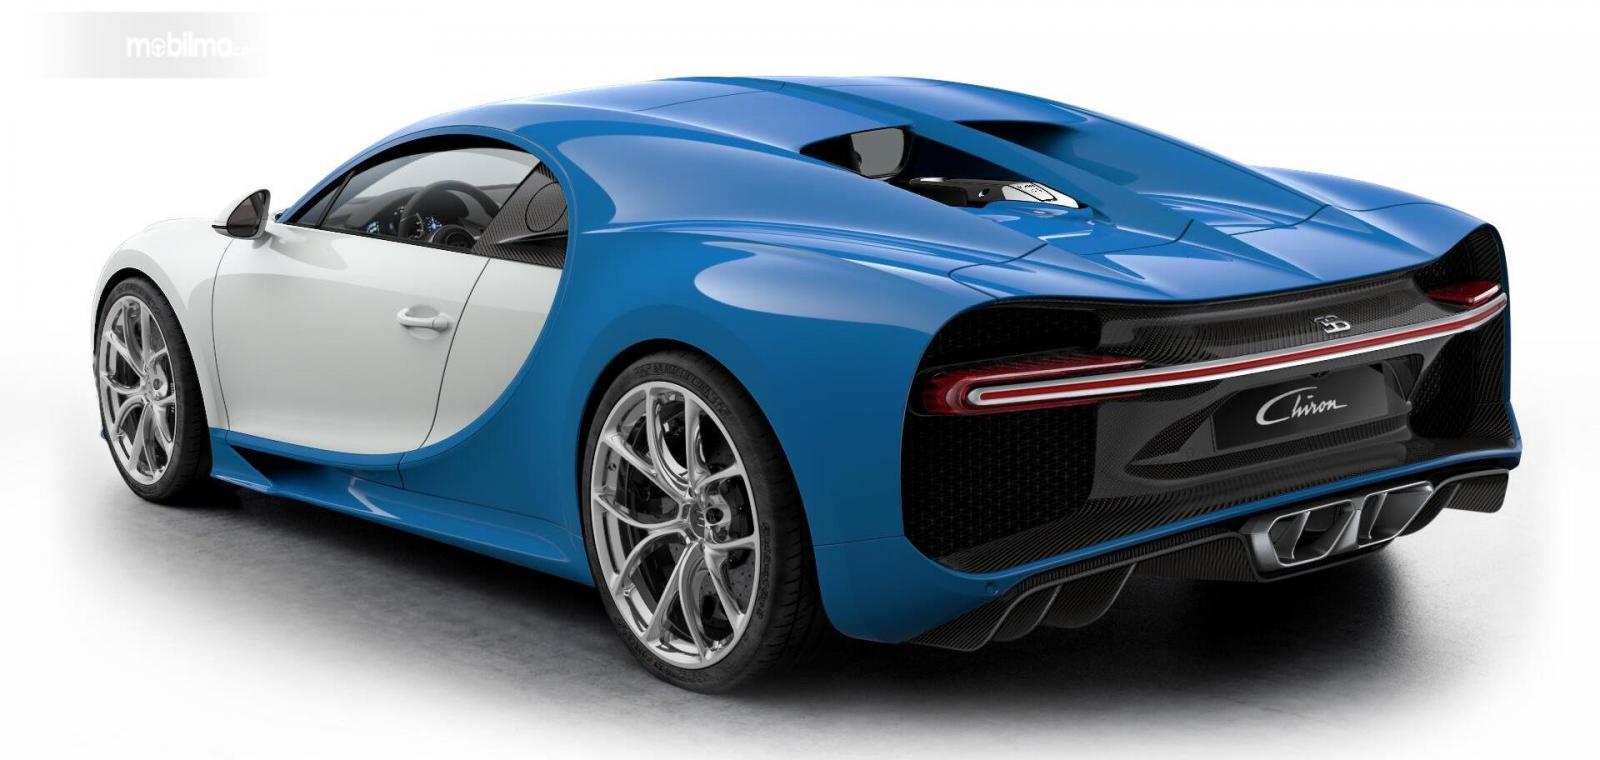 Foto Bugatti Chiron tampak dari belakang